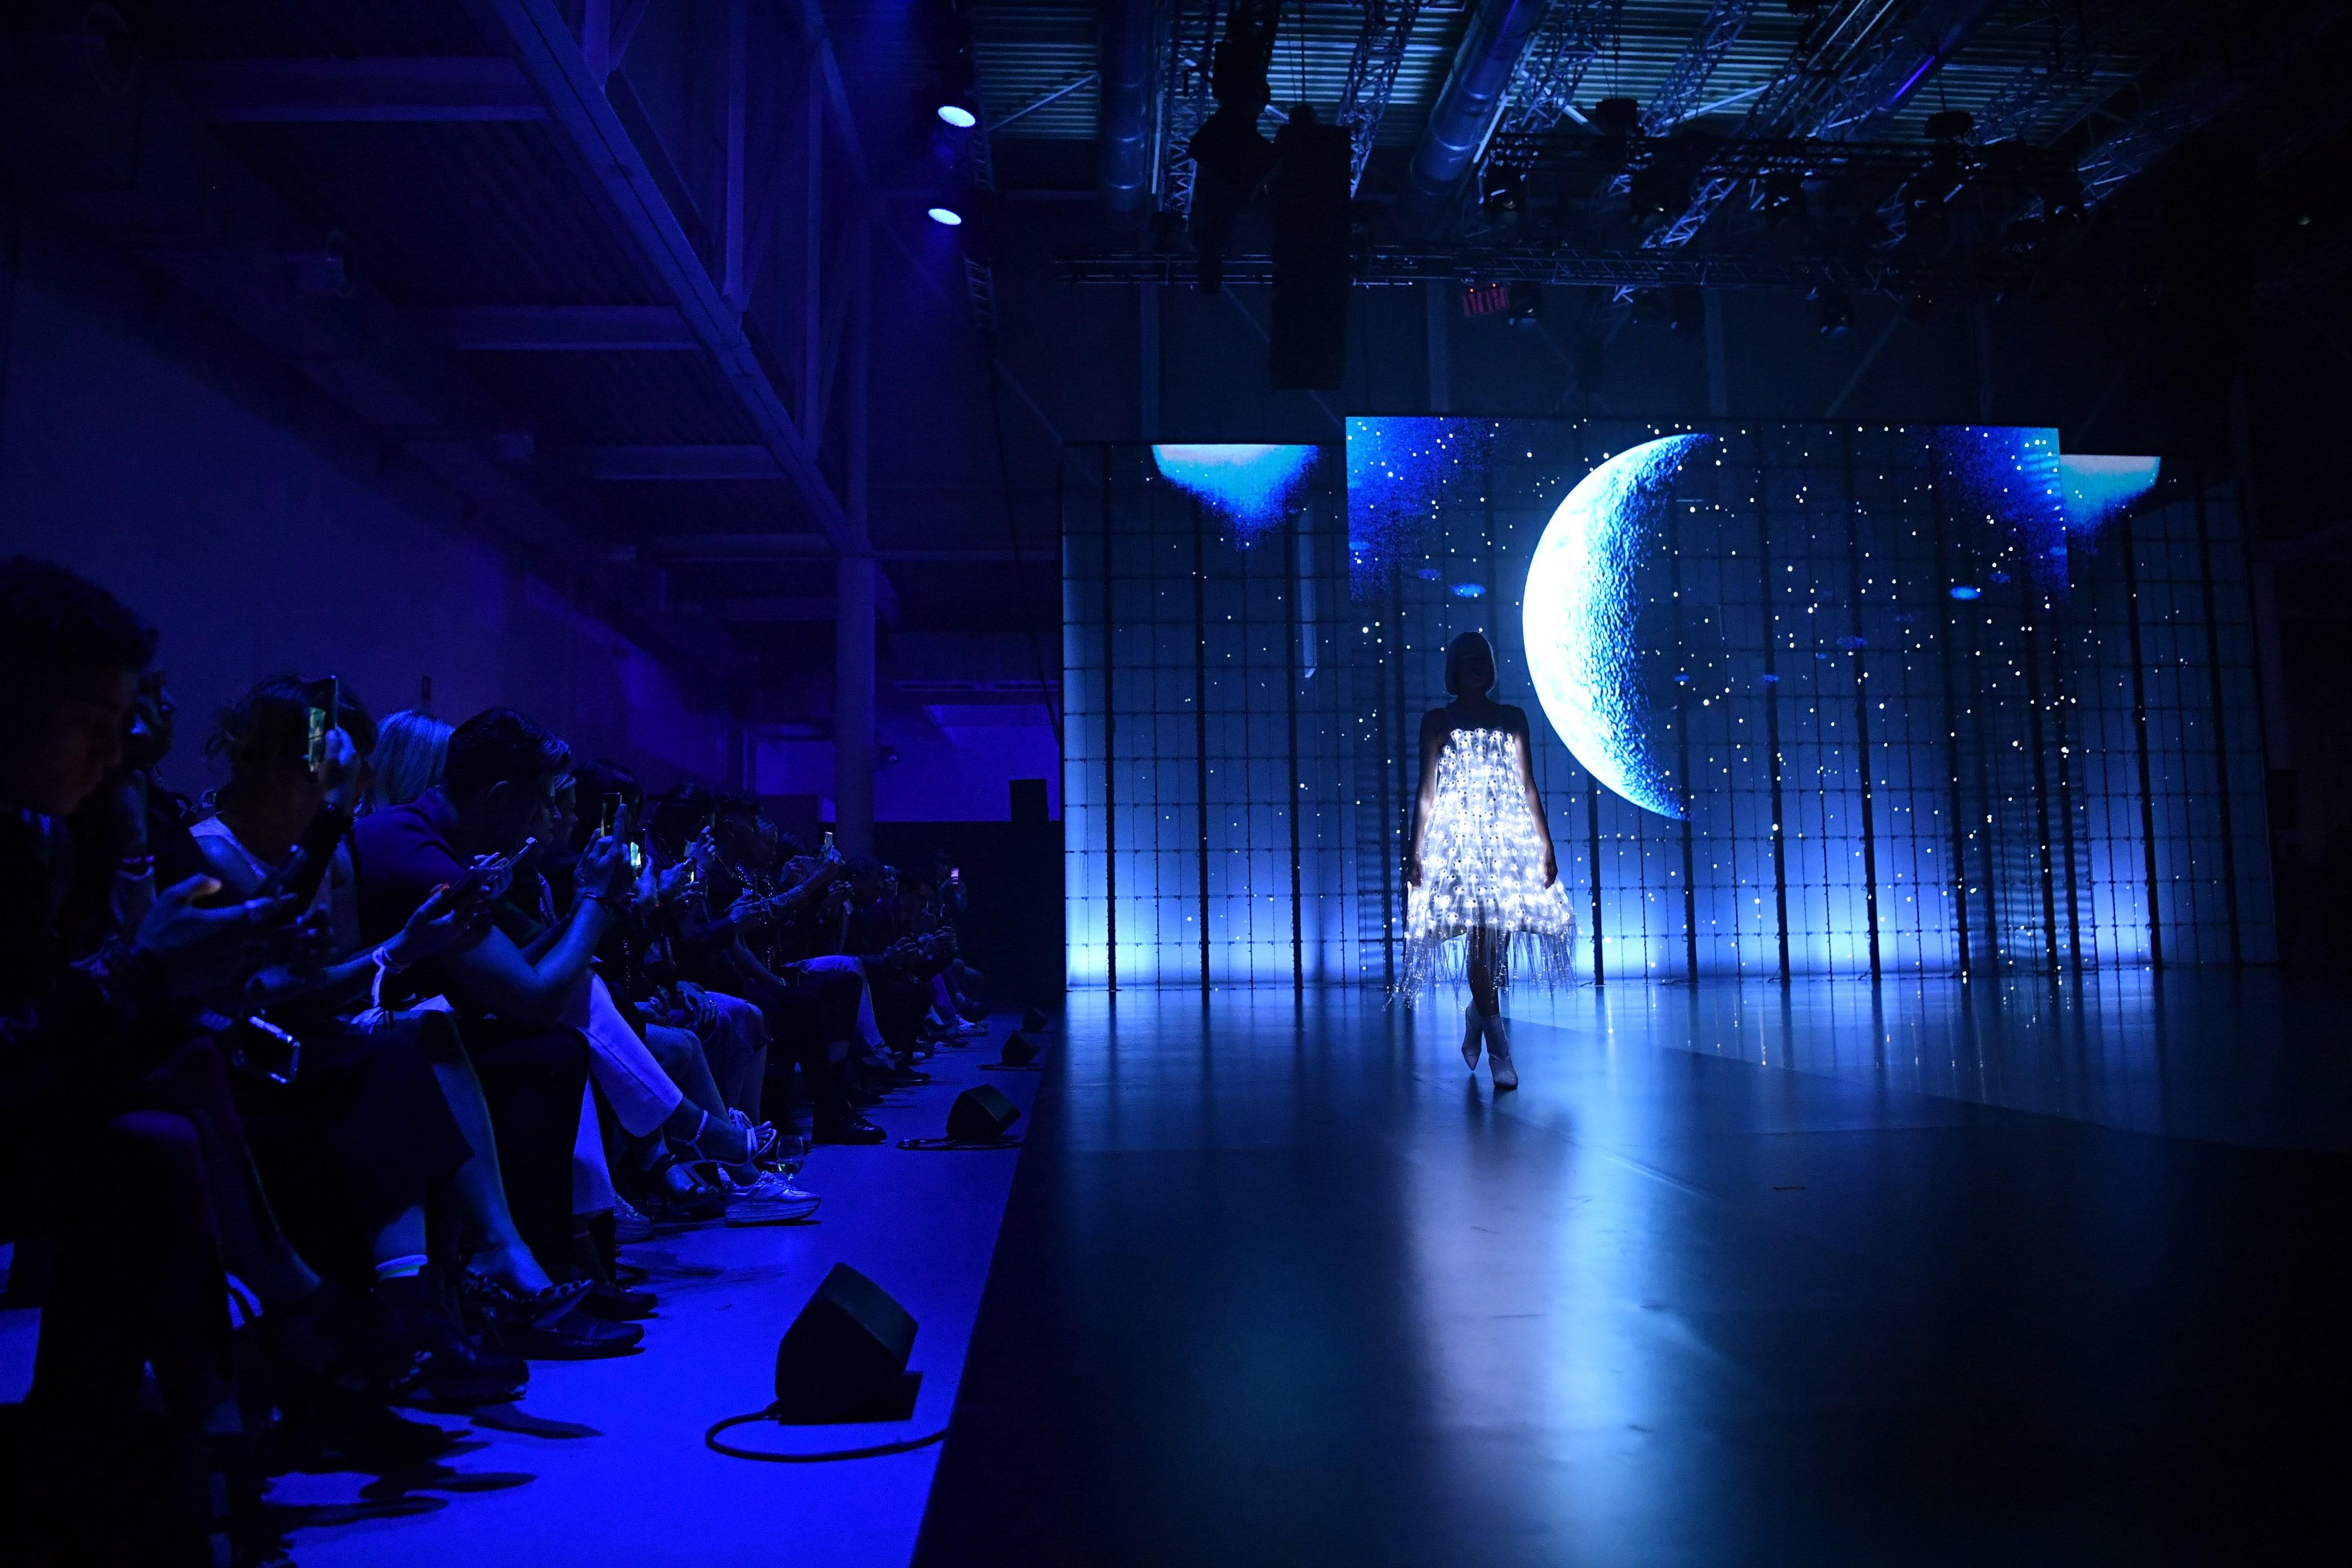 Sfilata al buio huawei fashion flair